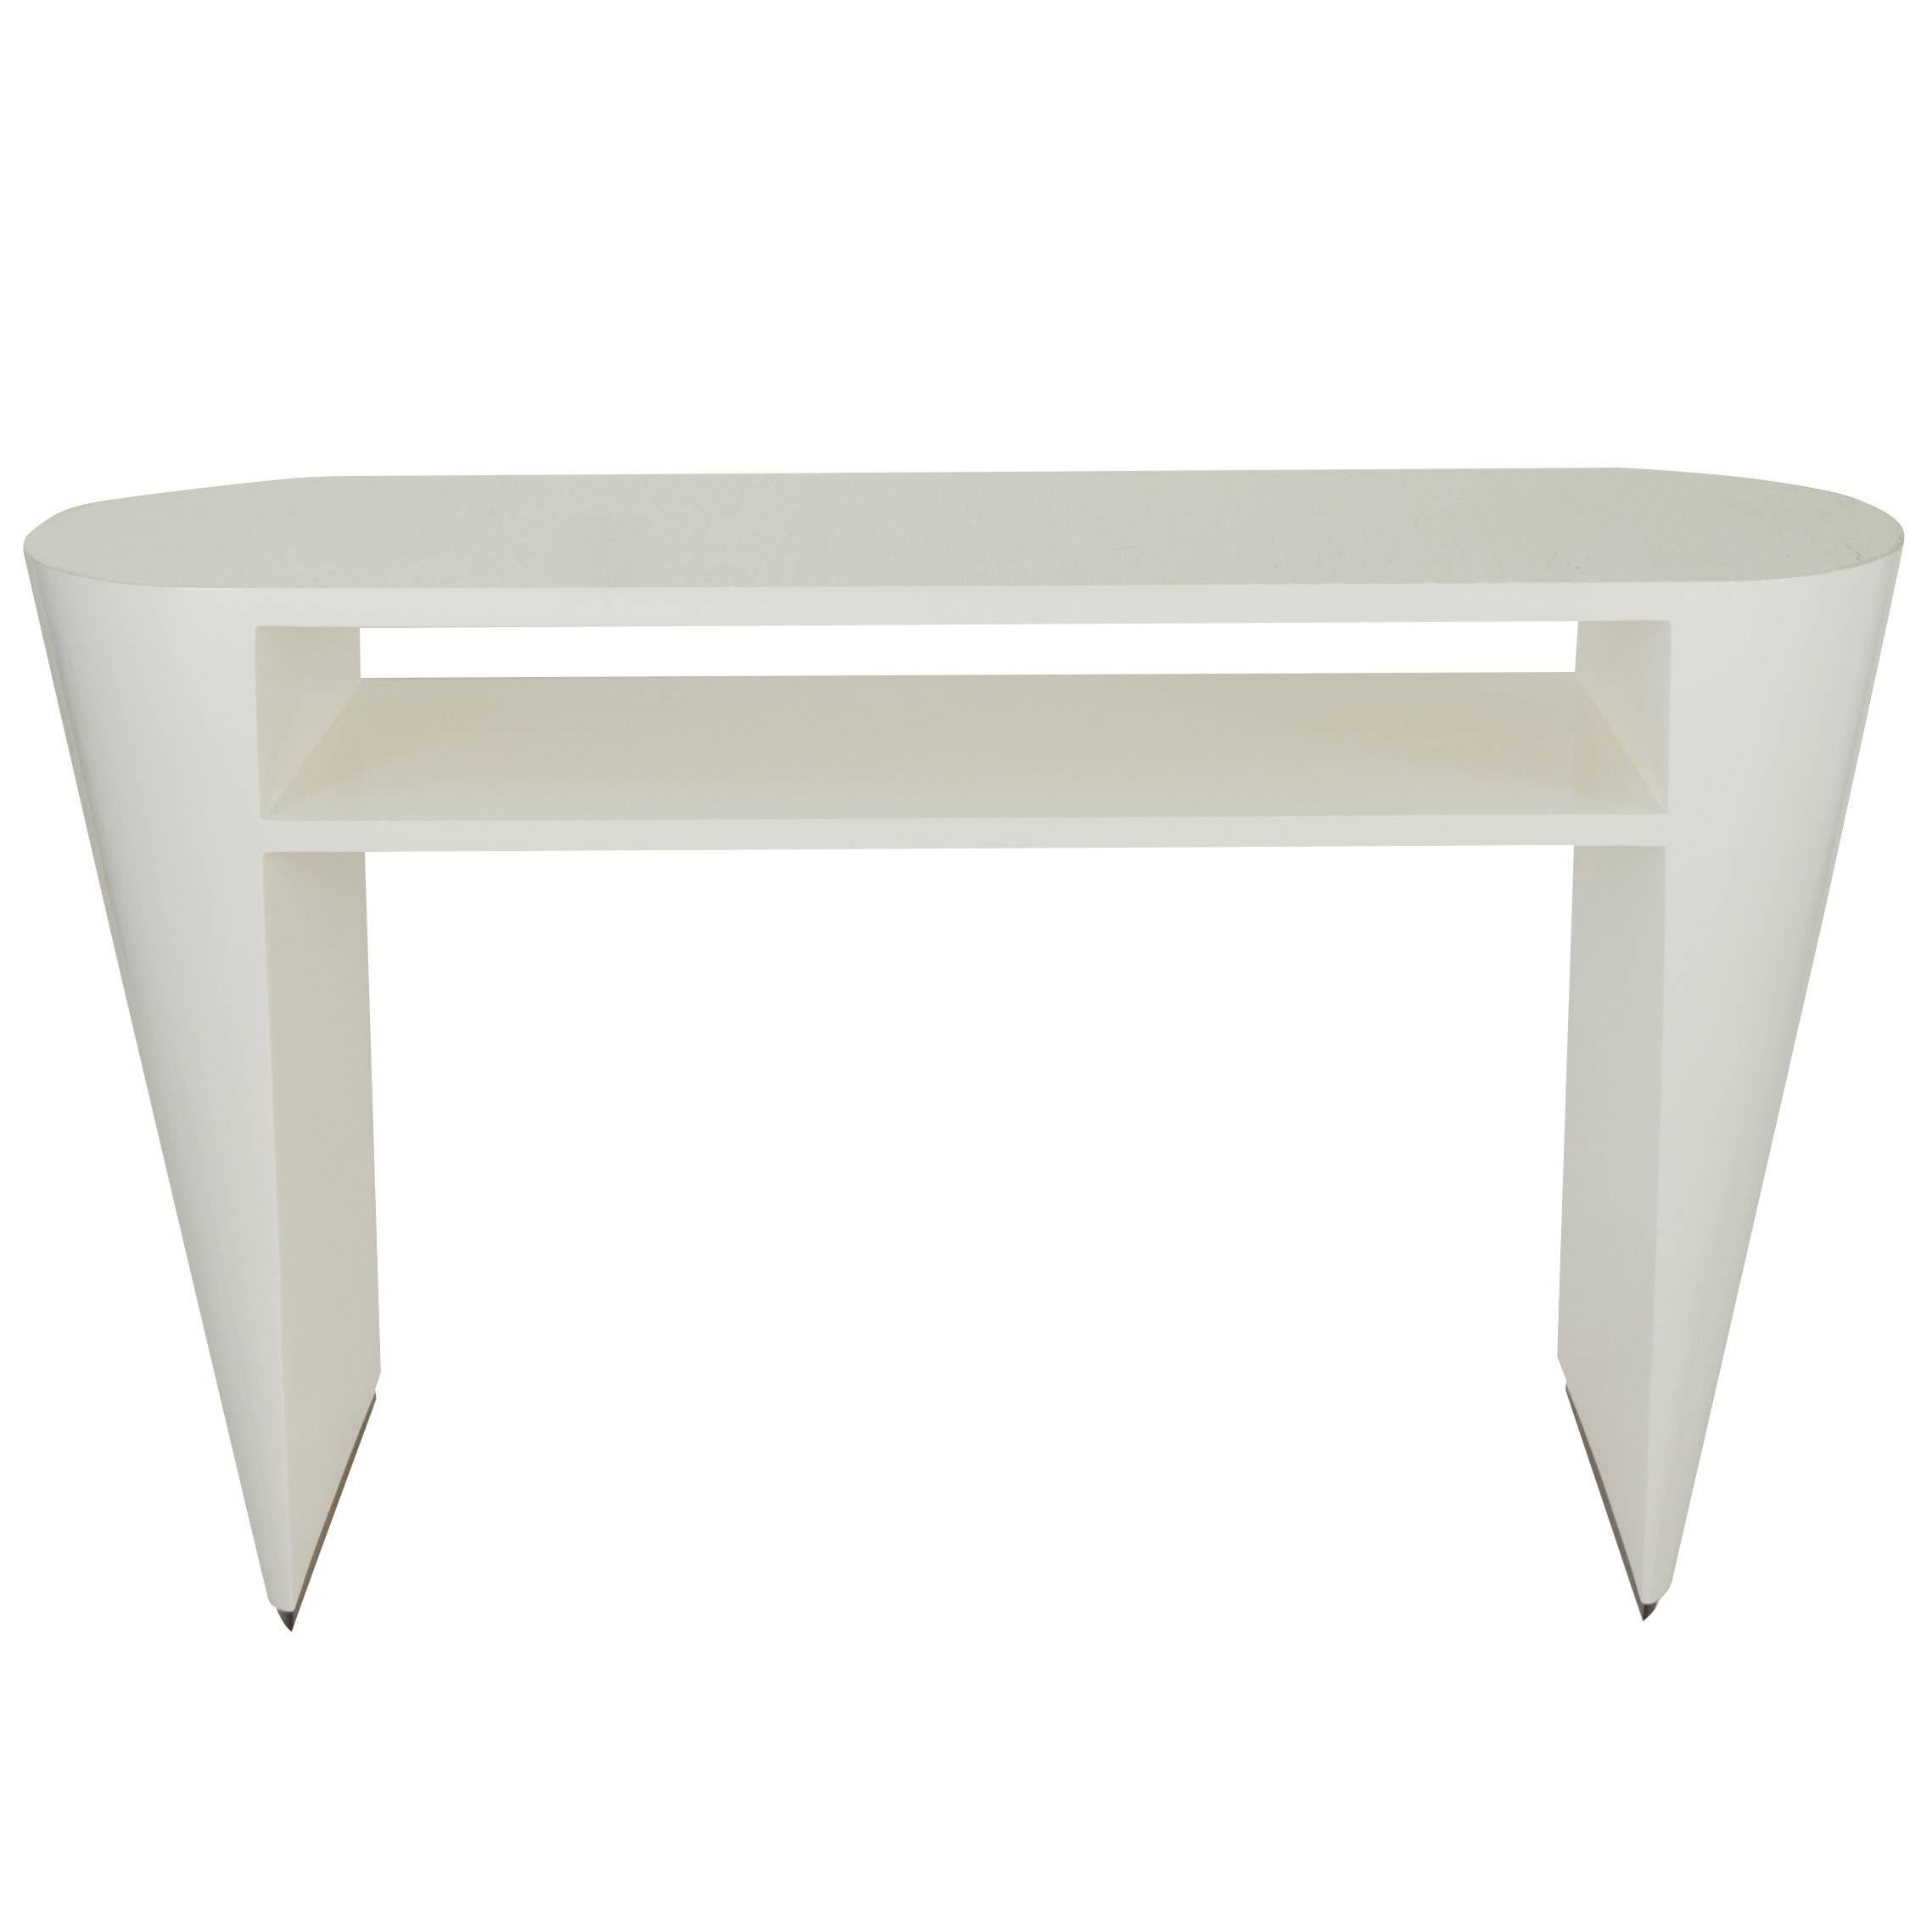 Art Deco White Lacquered Console Table